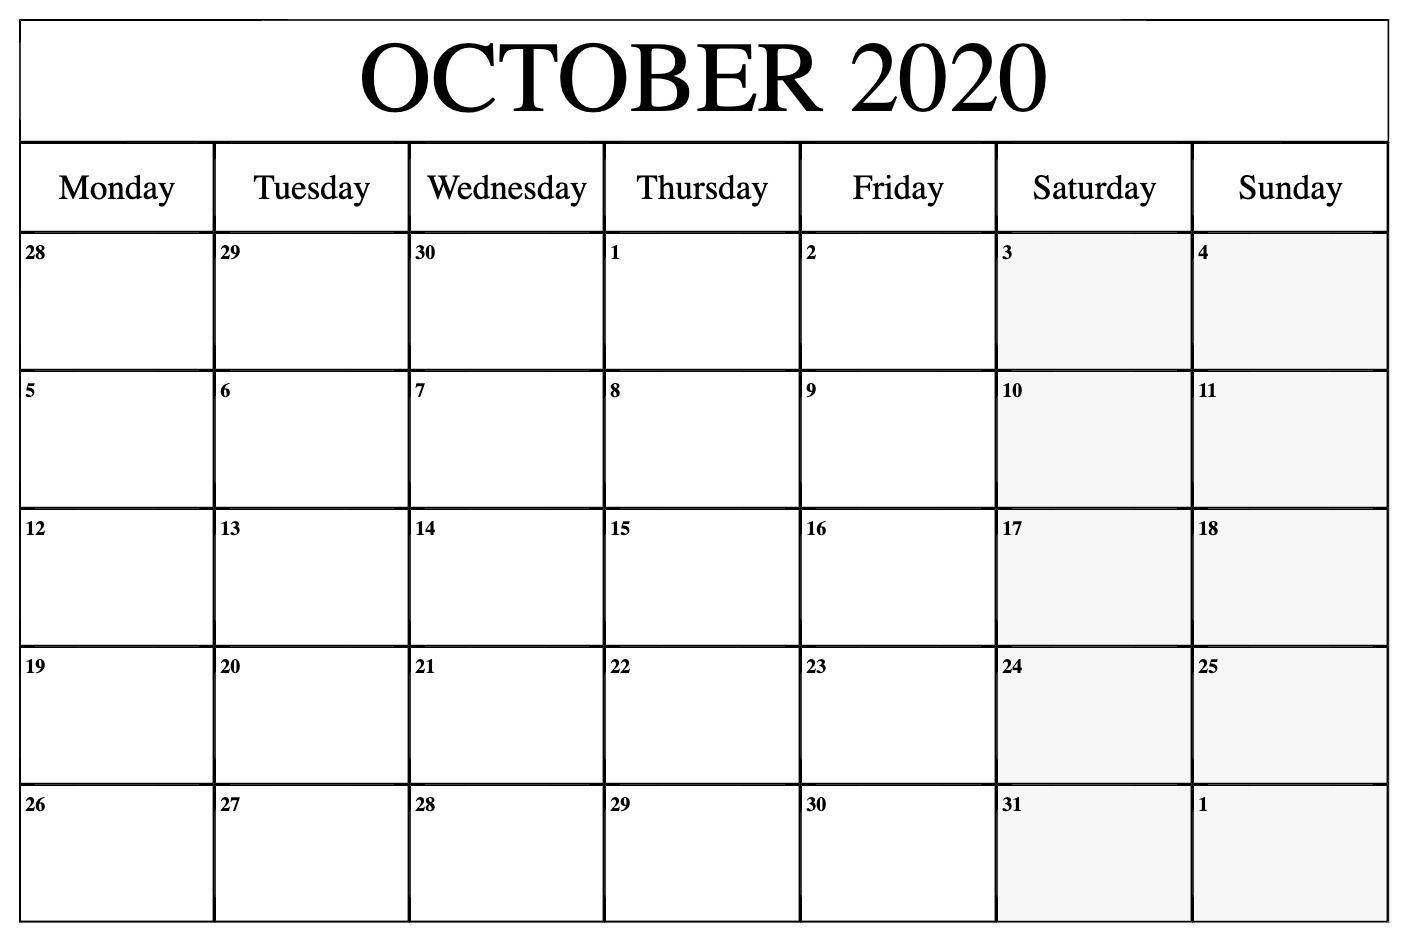 October 2020 Calendar Pdf, Word, Excel Template   Calendar